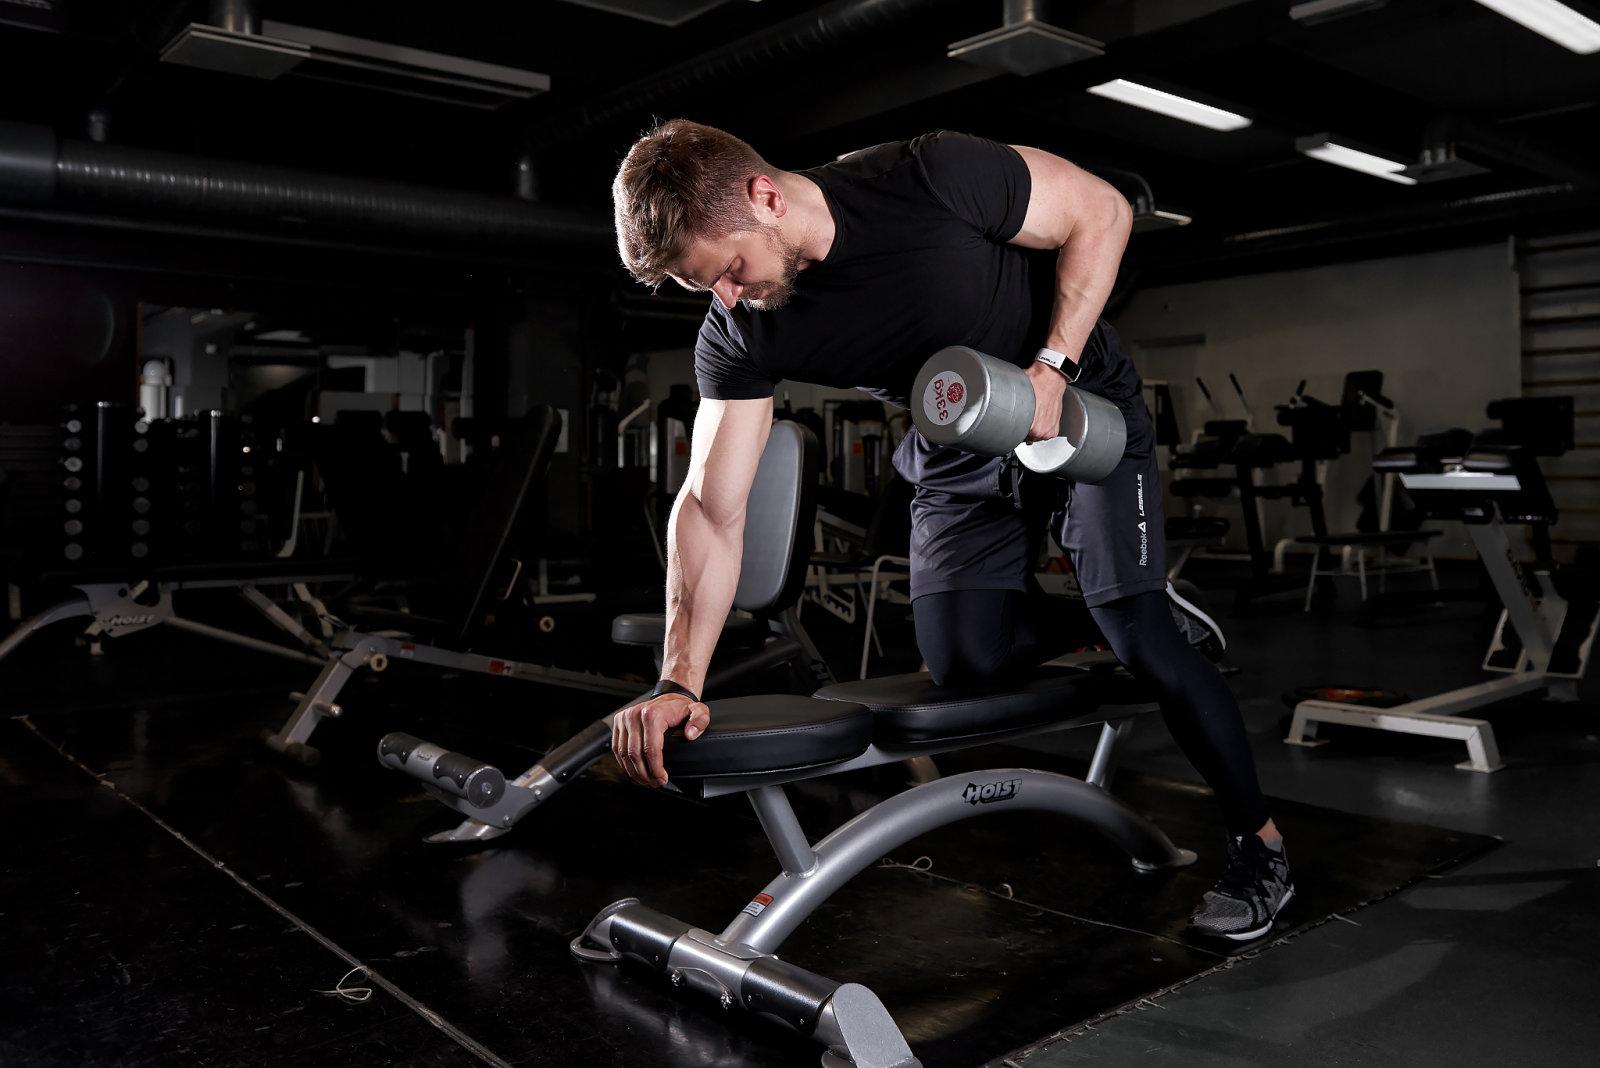 Kas intervalli treening poletab rasva Kui kiiresti keha poleb rasva